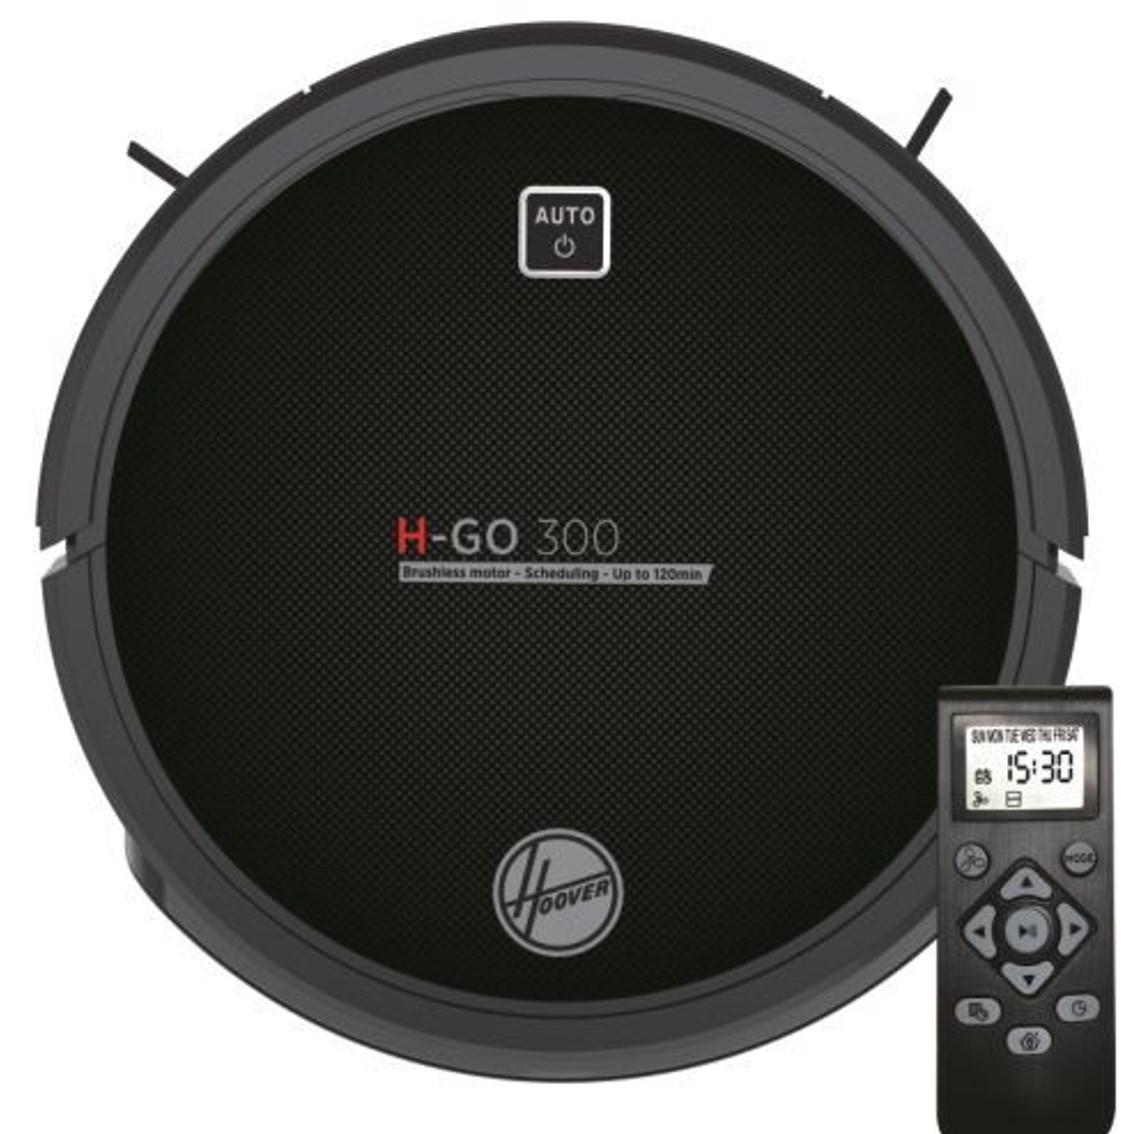 Robot Aspiador Hoover H-GO 300